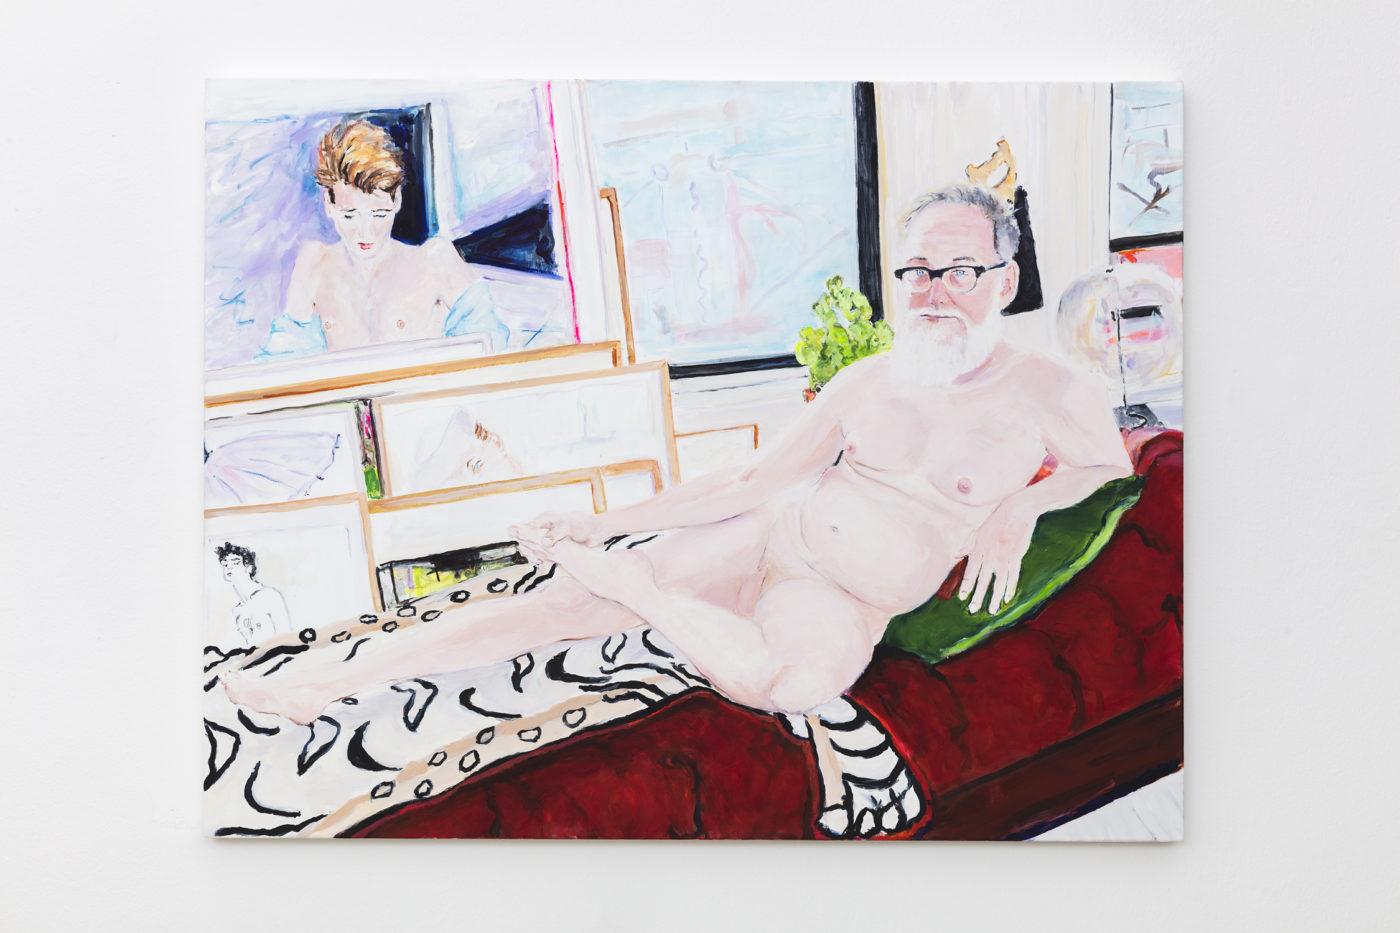 Billy Sullivan, Muses, installation view, kaufmann repetto, Milano, 2019